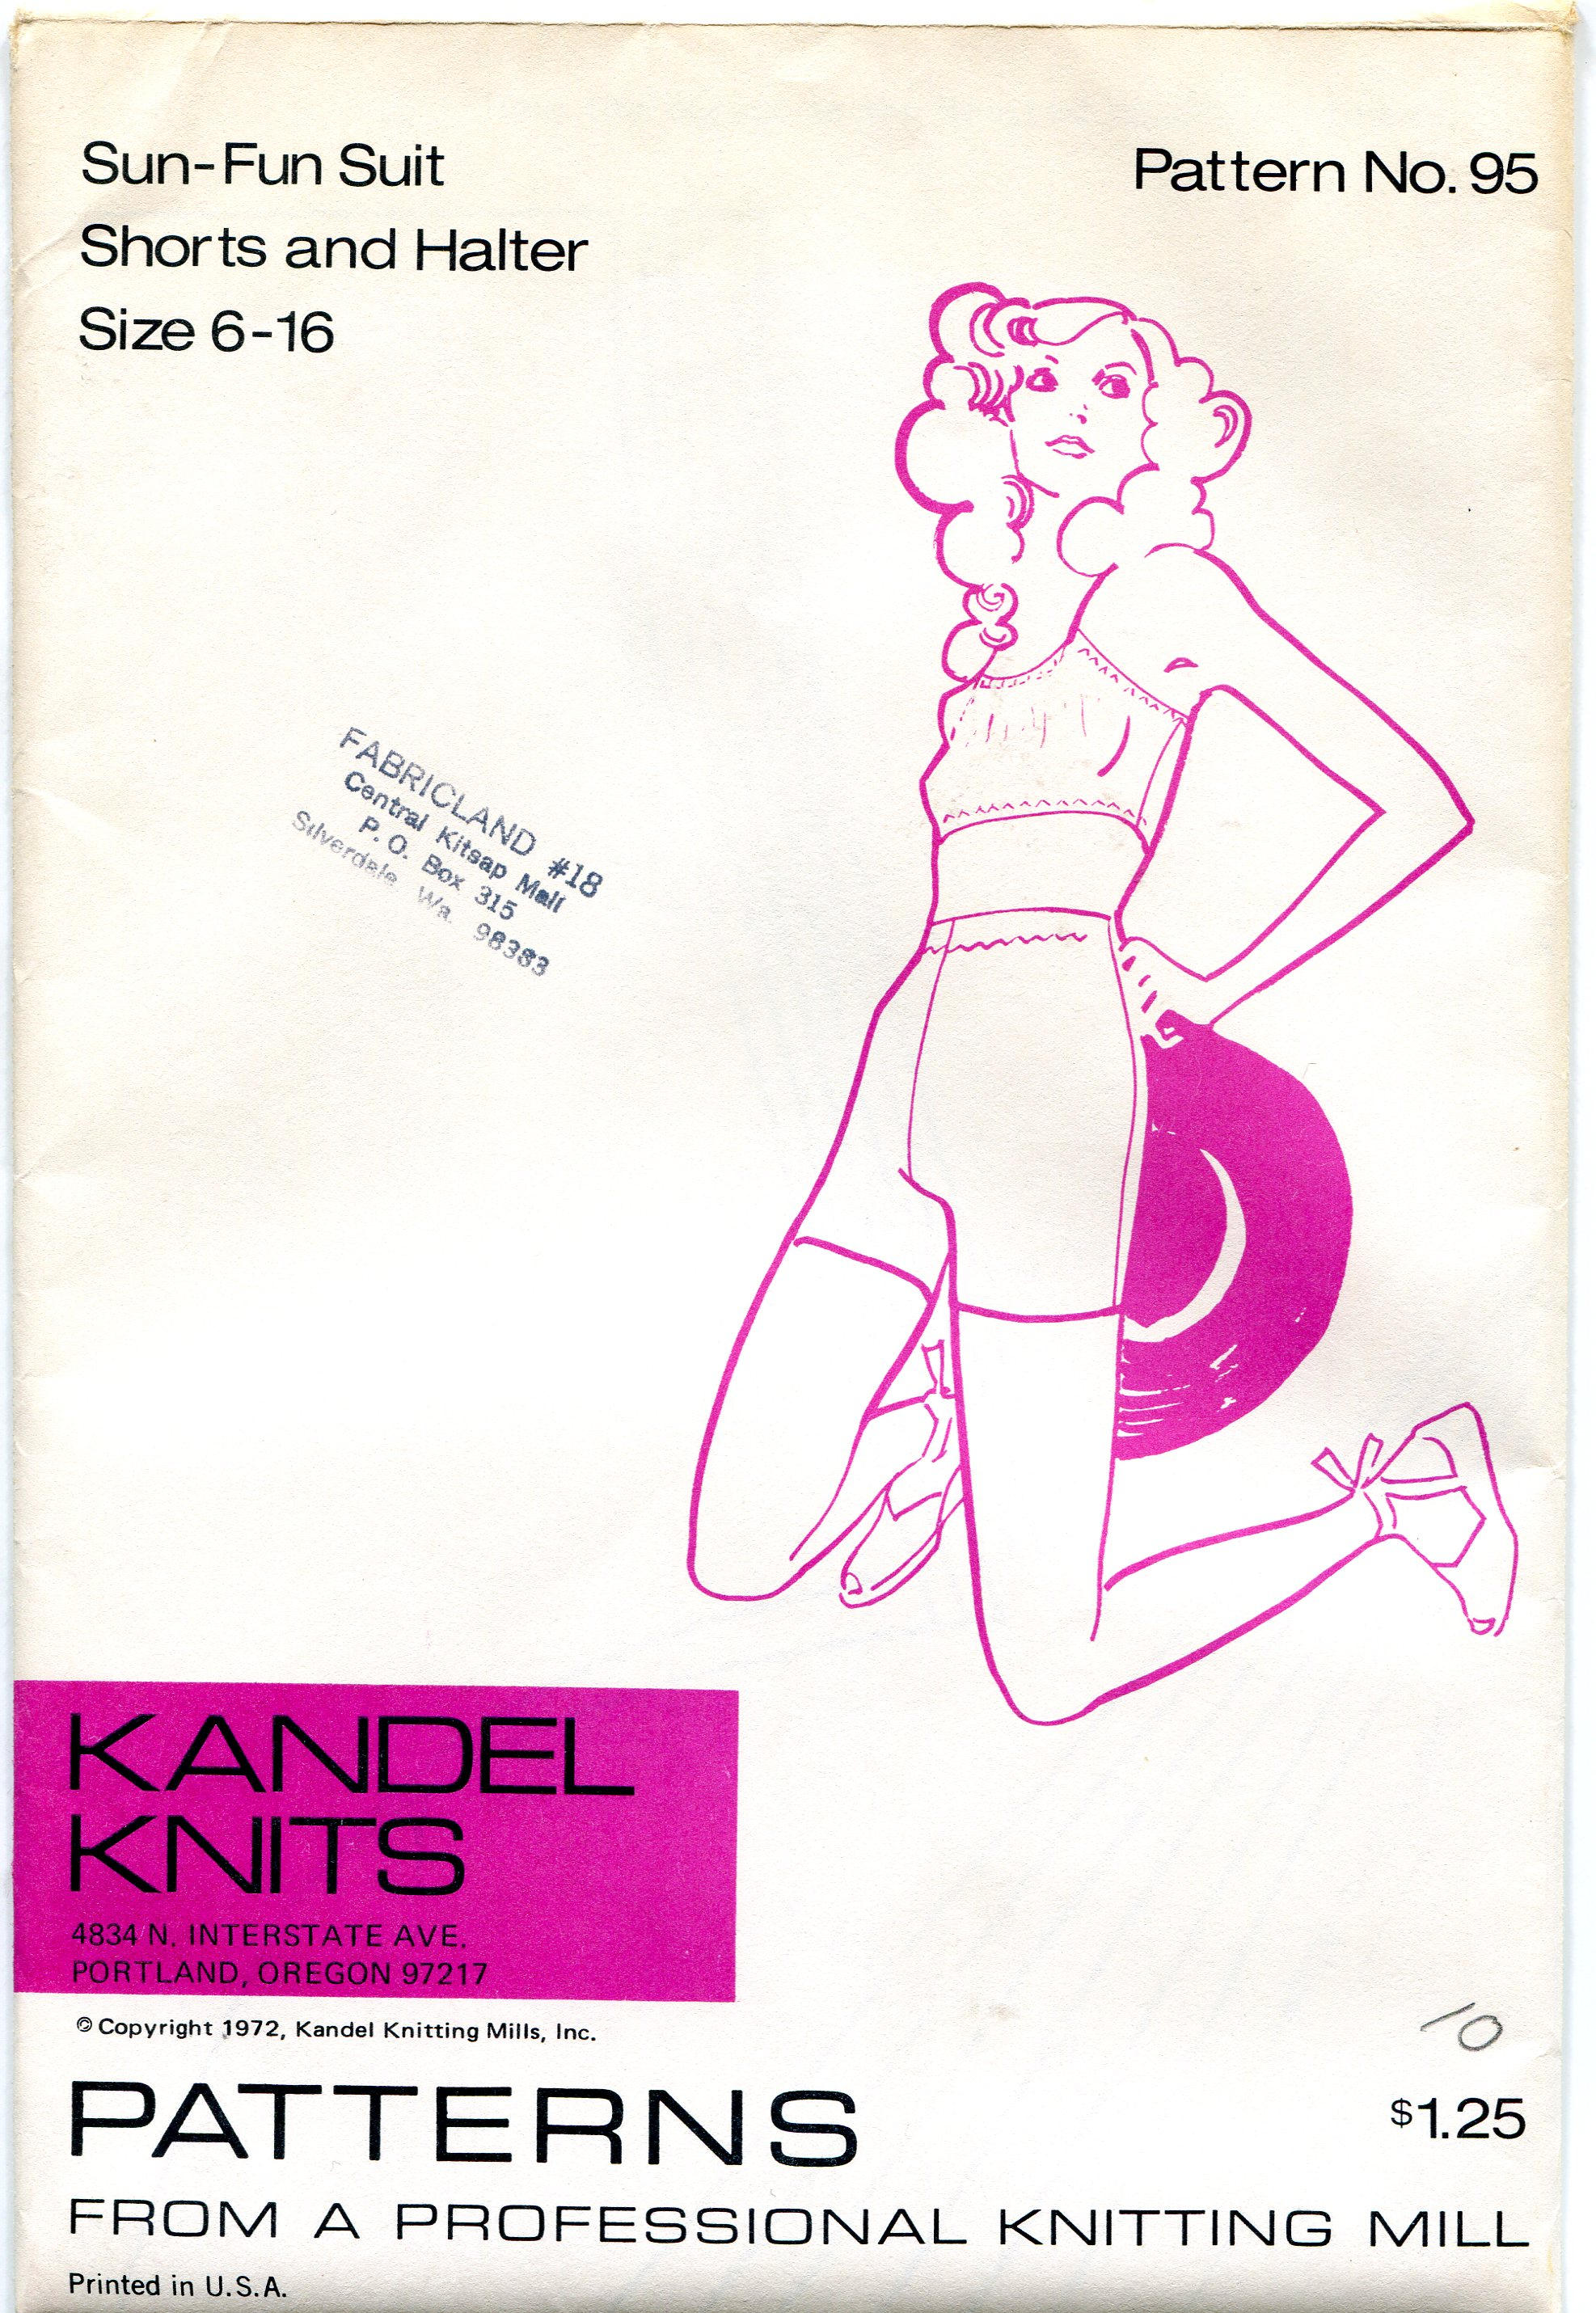 Kandel Knits 95